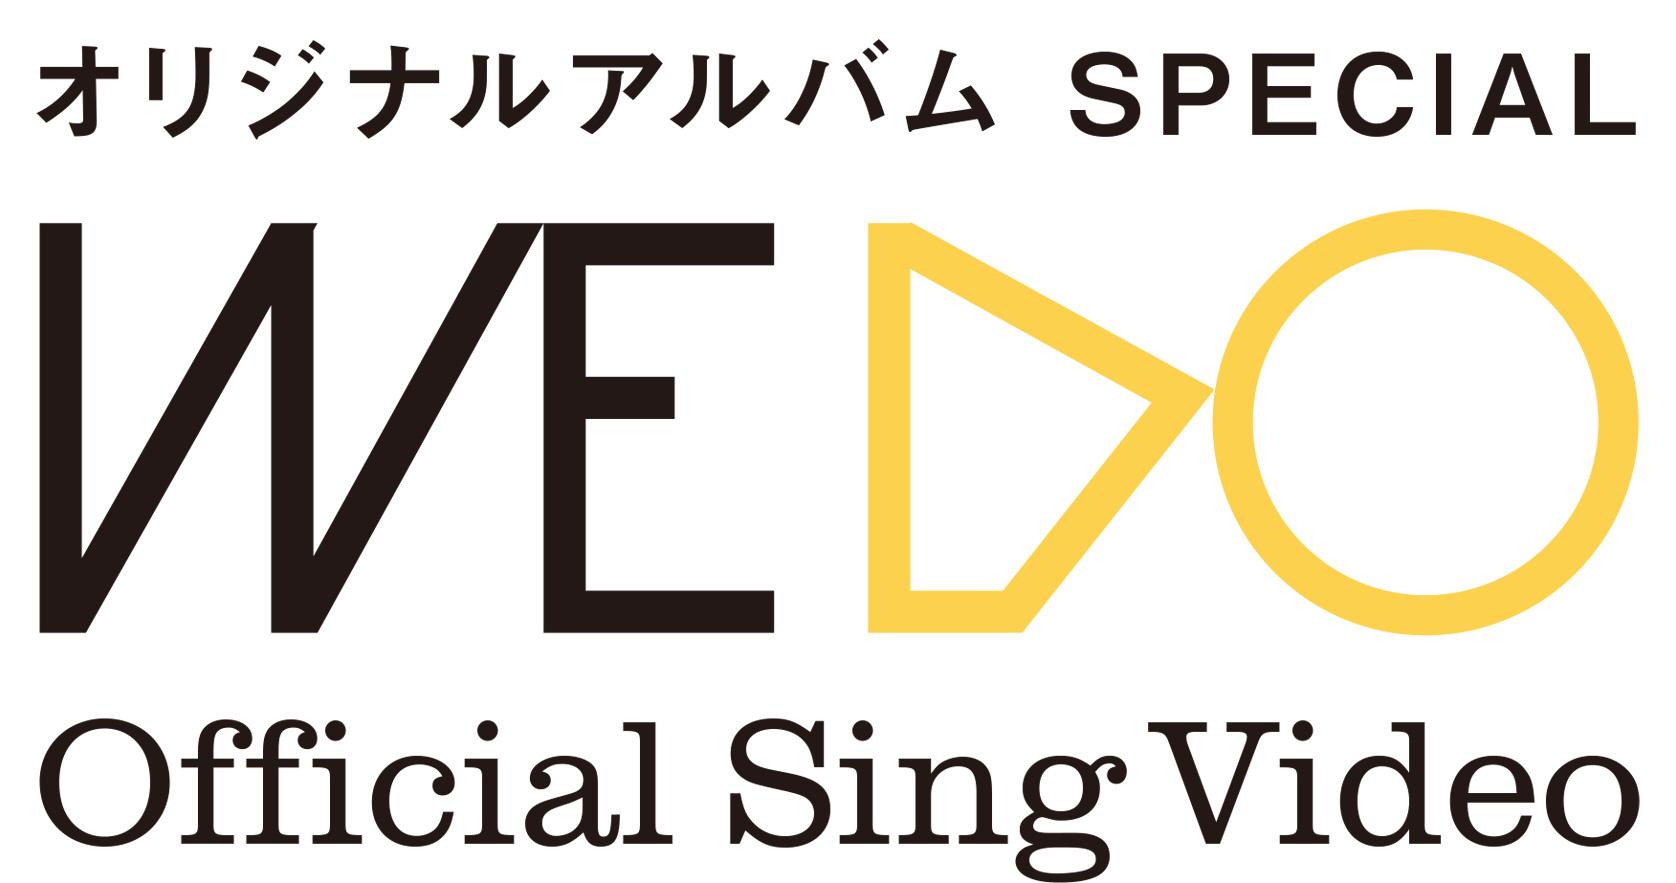 singvideo